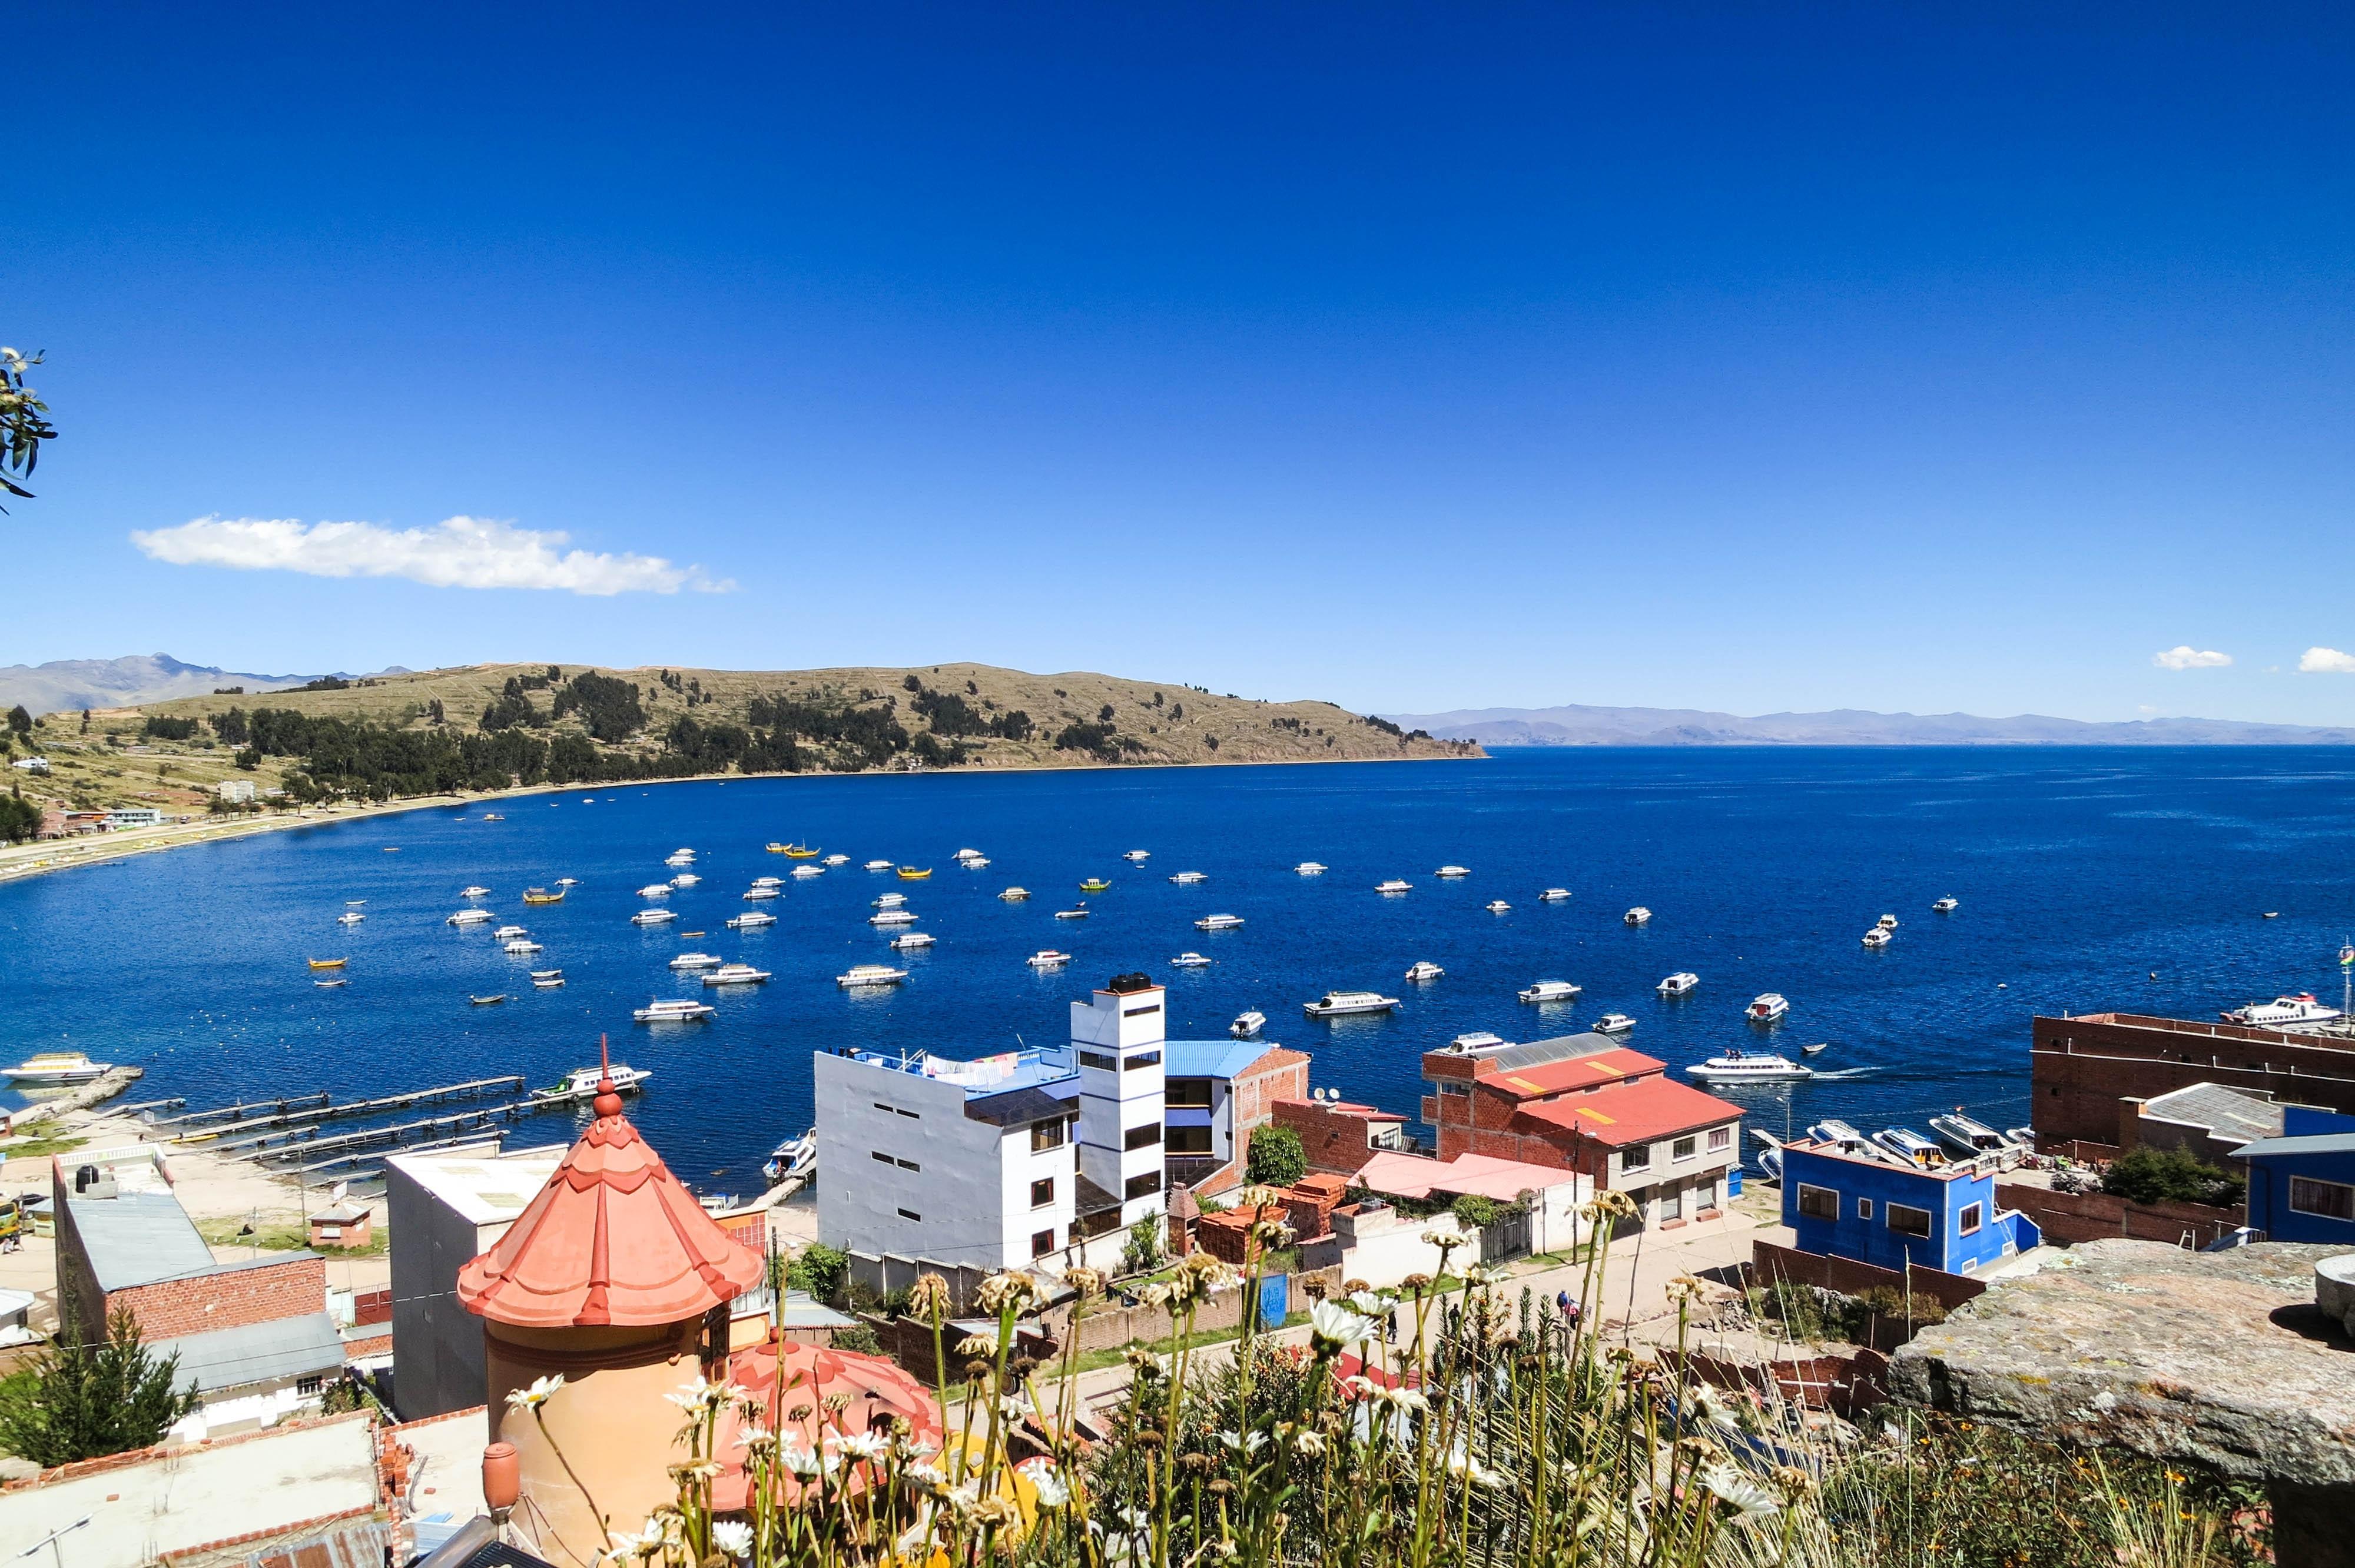 Beach Sea Coast Water Sky Town Panorama Vacation Bay Marina Buildings Resort Mountains Boats Copacabana Bolivia